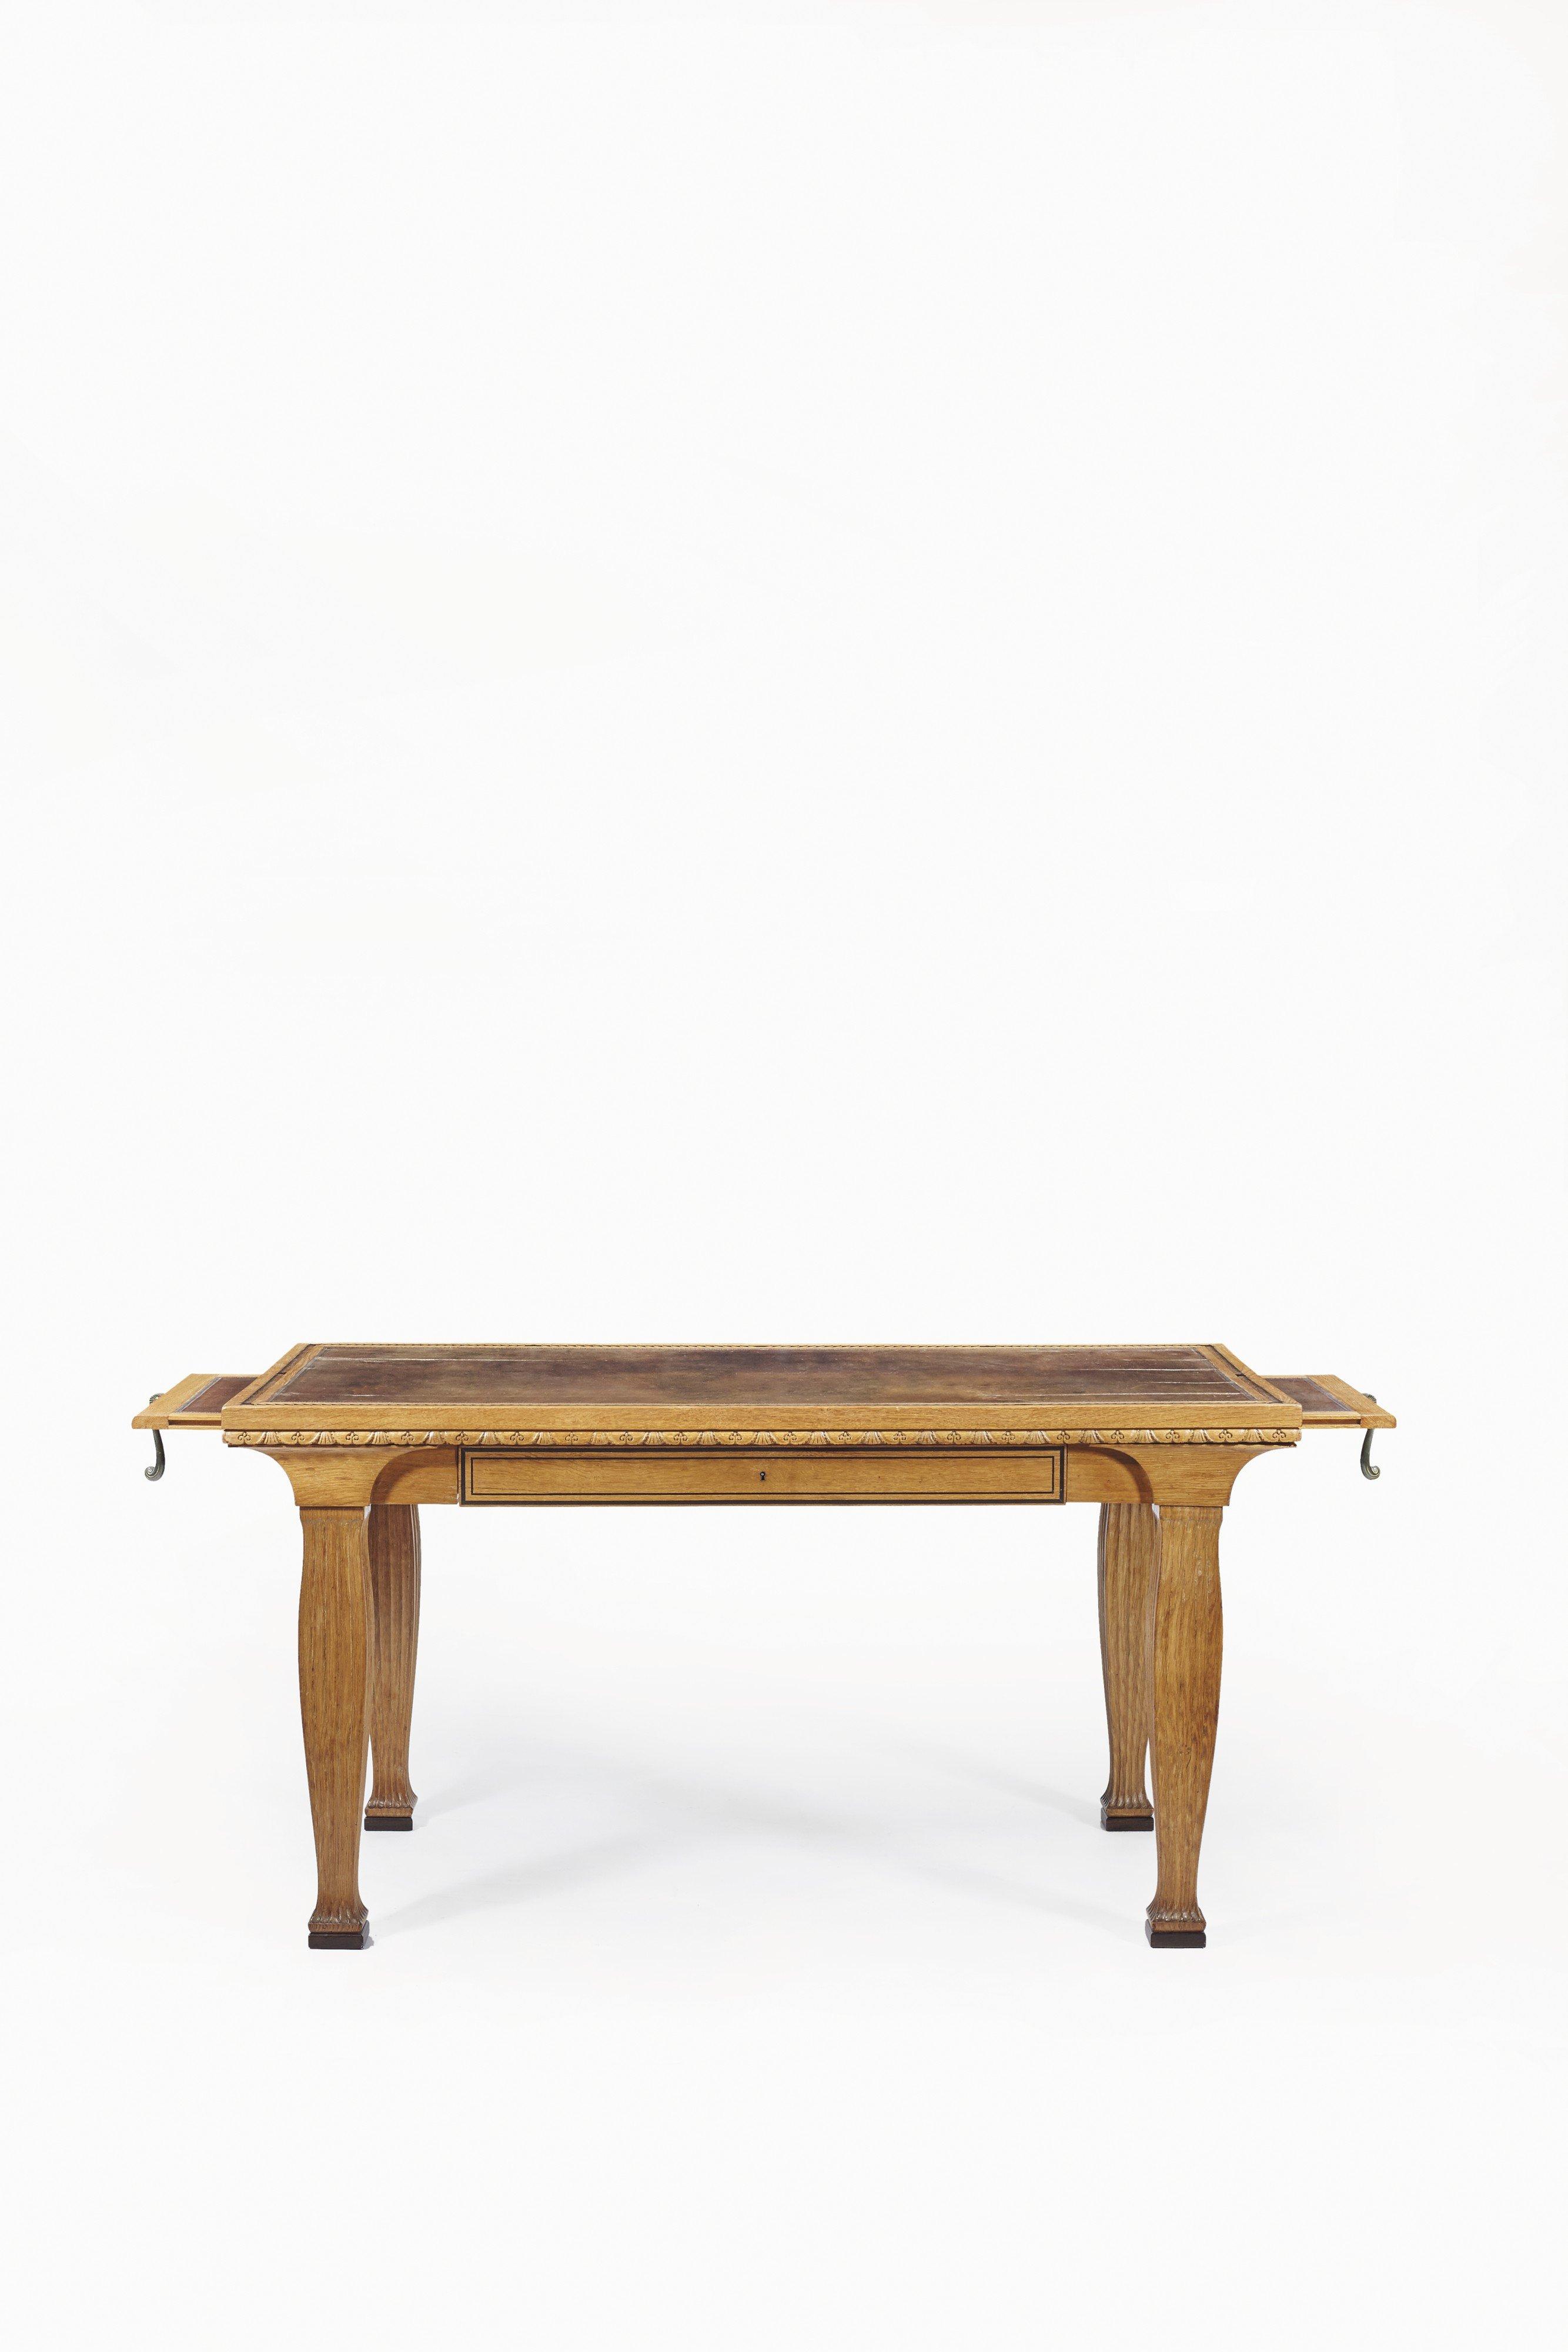 Lanvin Presents Fashion's Most Iconic Furniture…